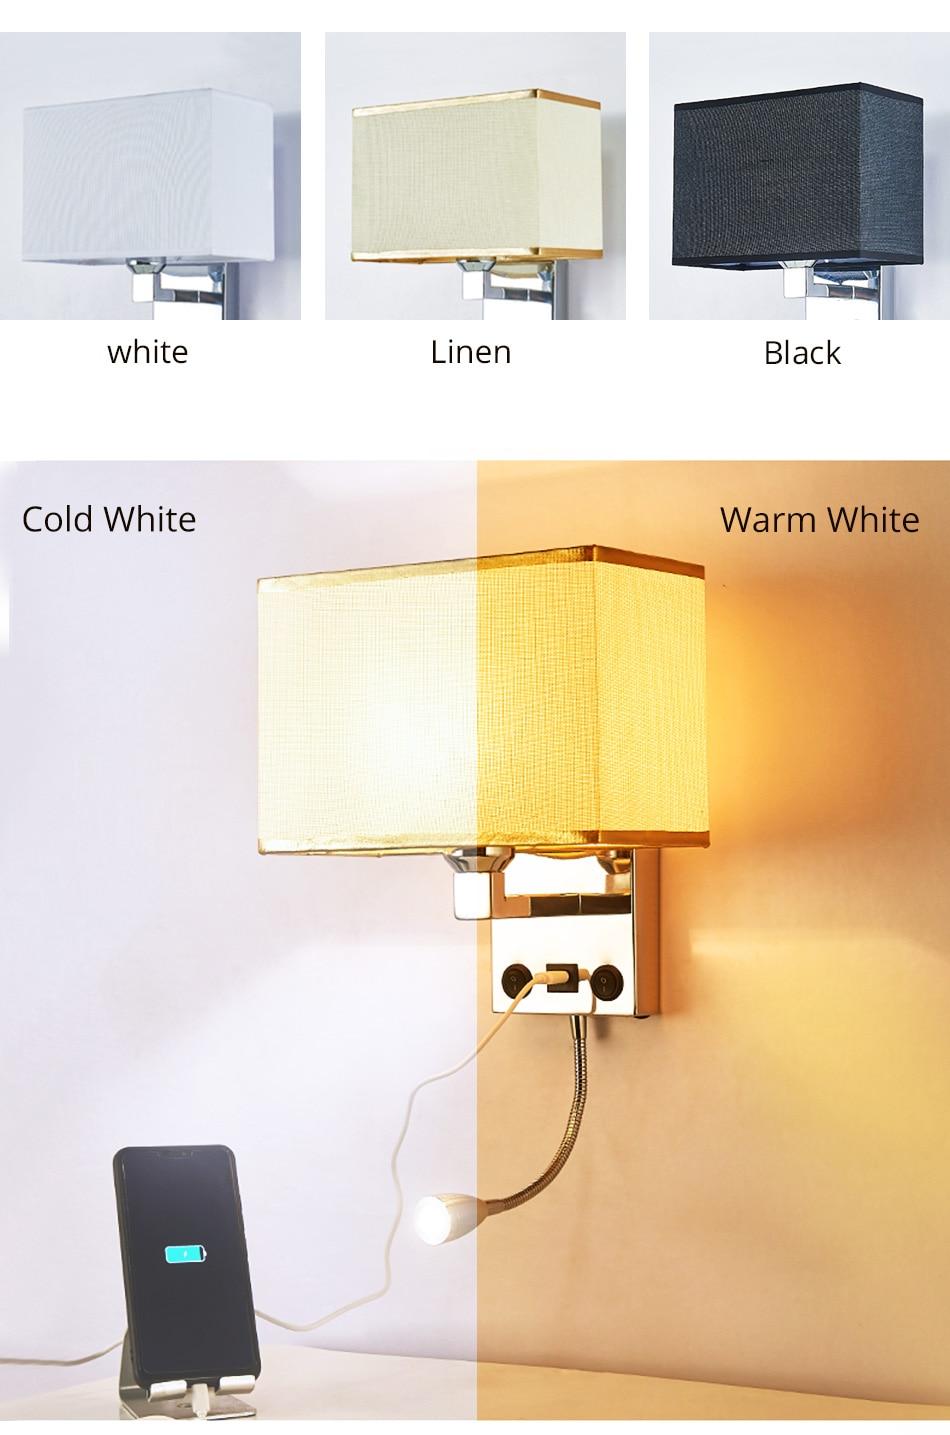 LED E27 Bulb Wall Light Modern Bedroom Bedside Hotel Living Room Wall Sconce Lighting 7W 85-265V Indoor Night Lighting Fixture (4)